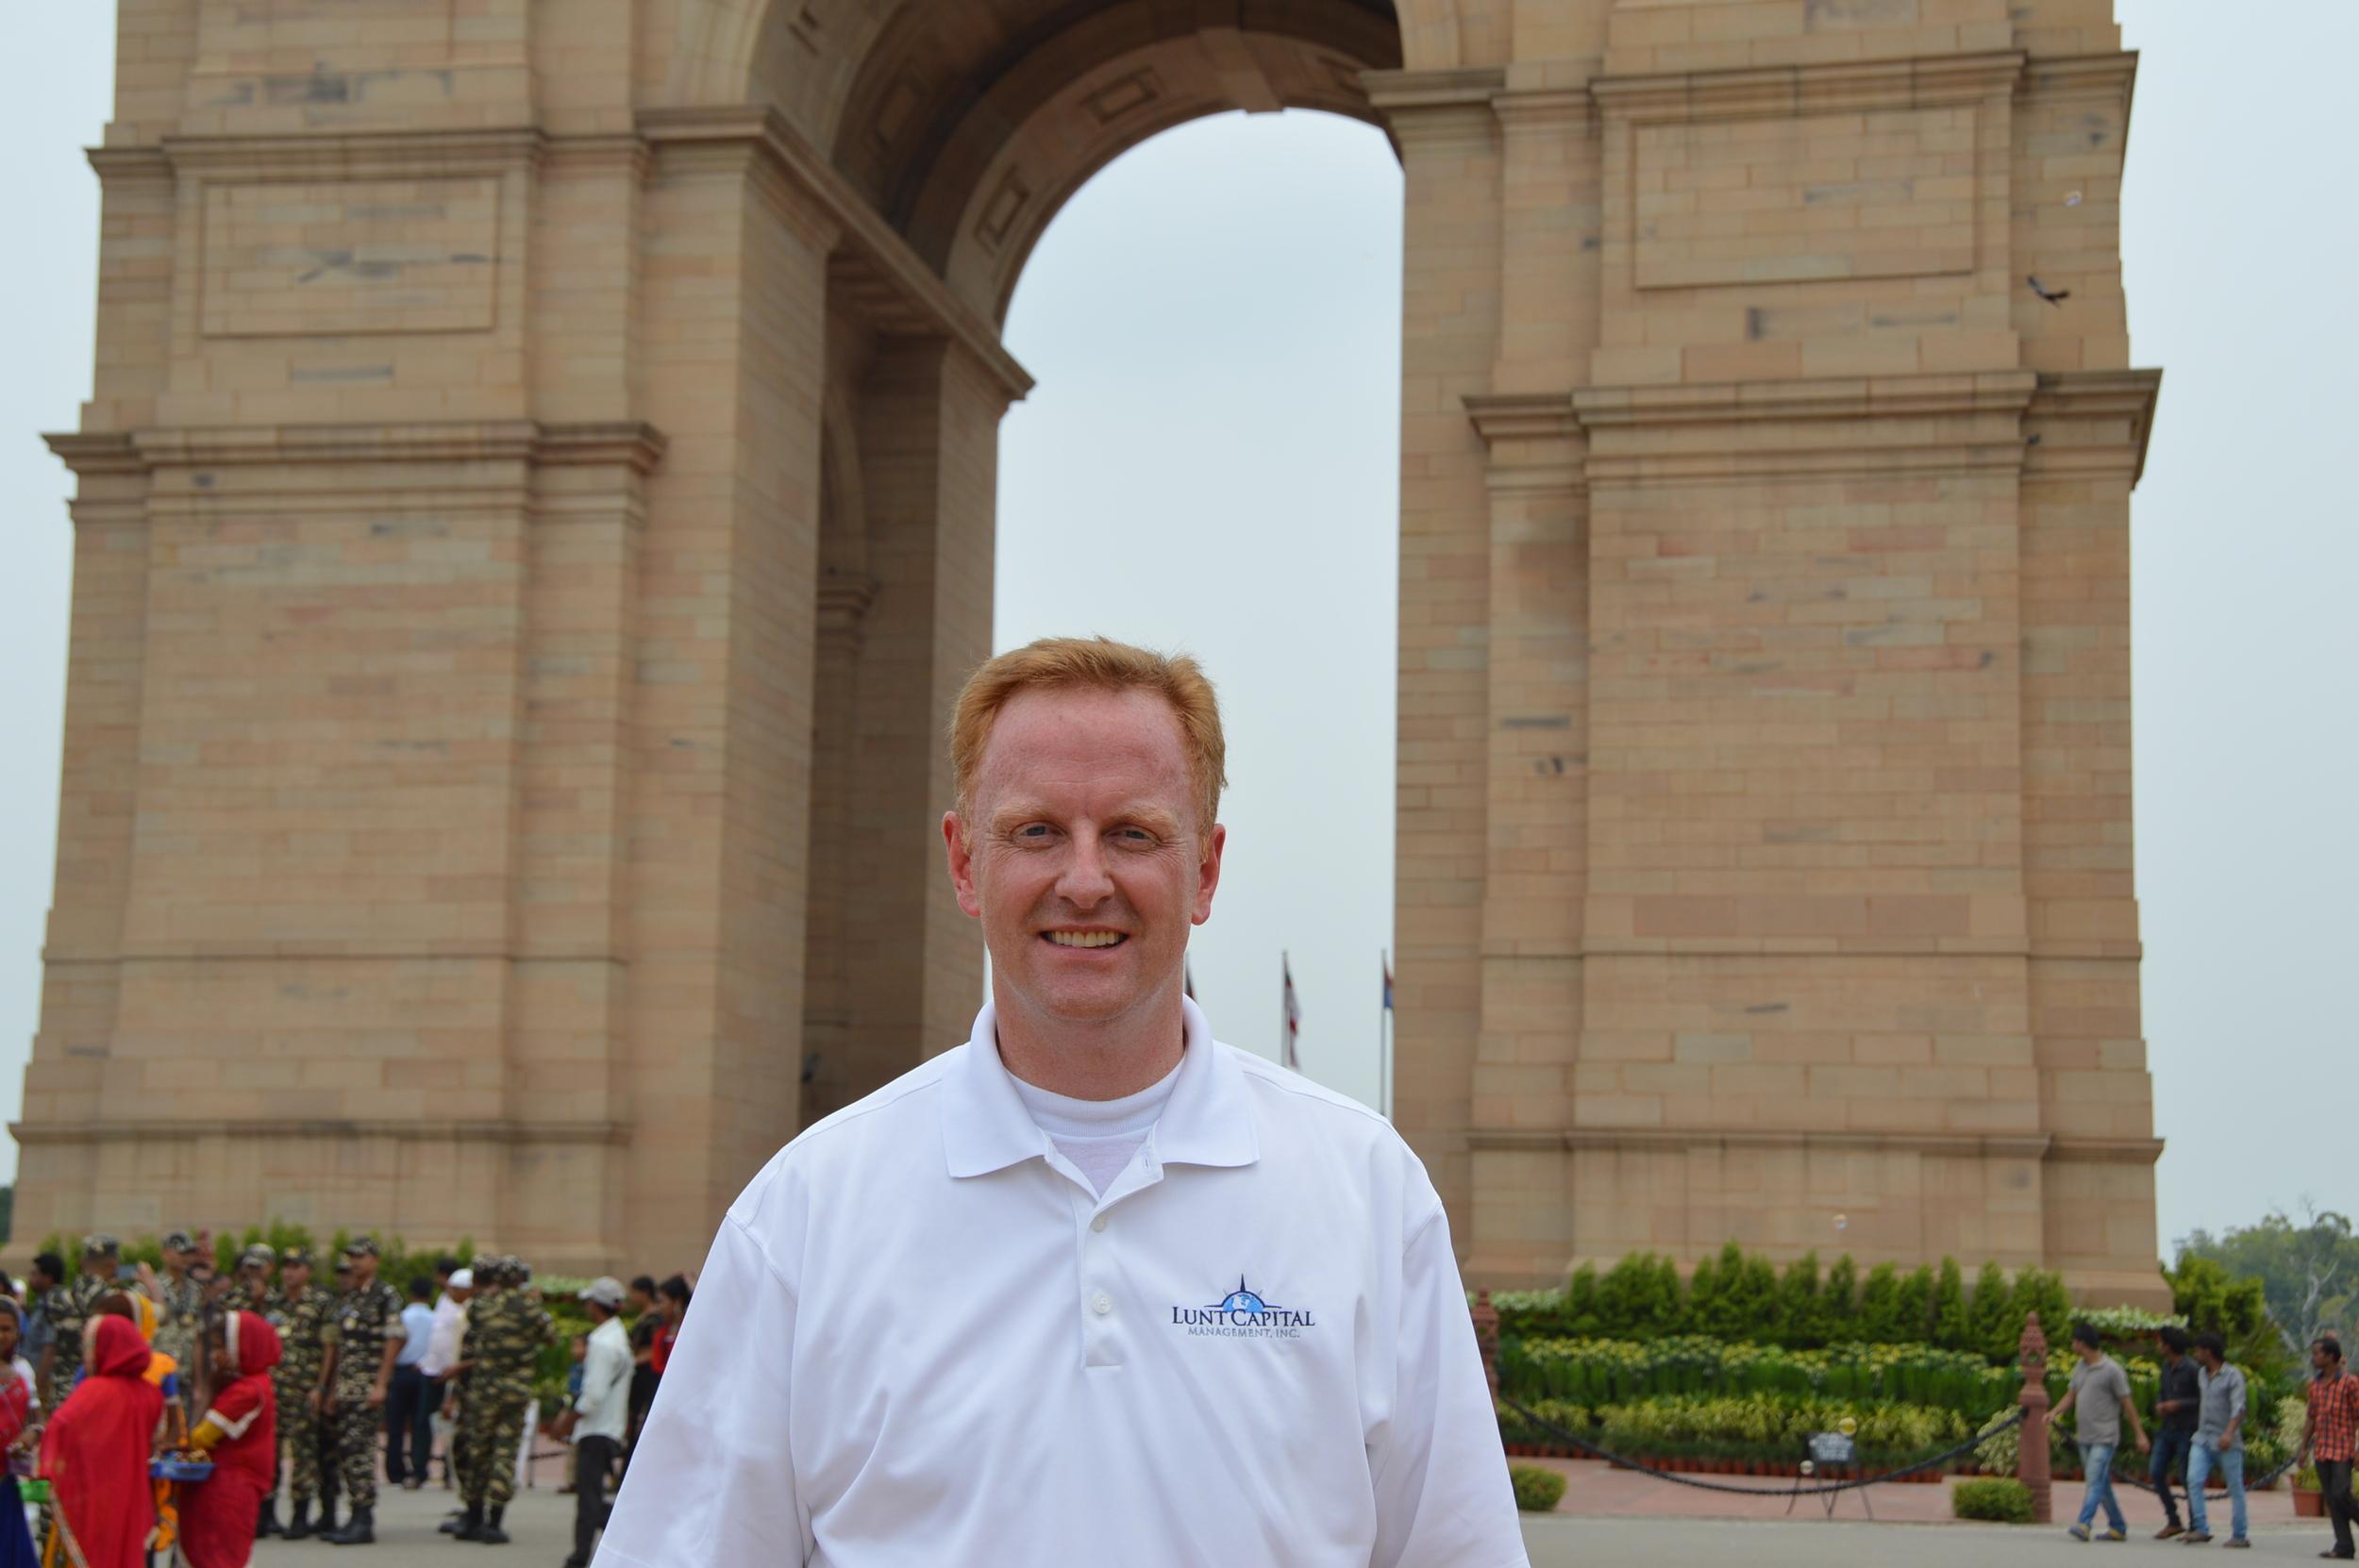 Ryan Hessenthaler at the India Gate